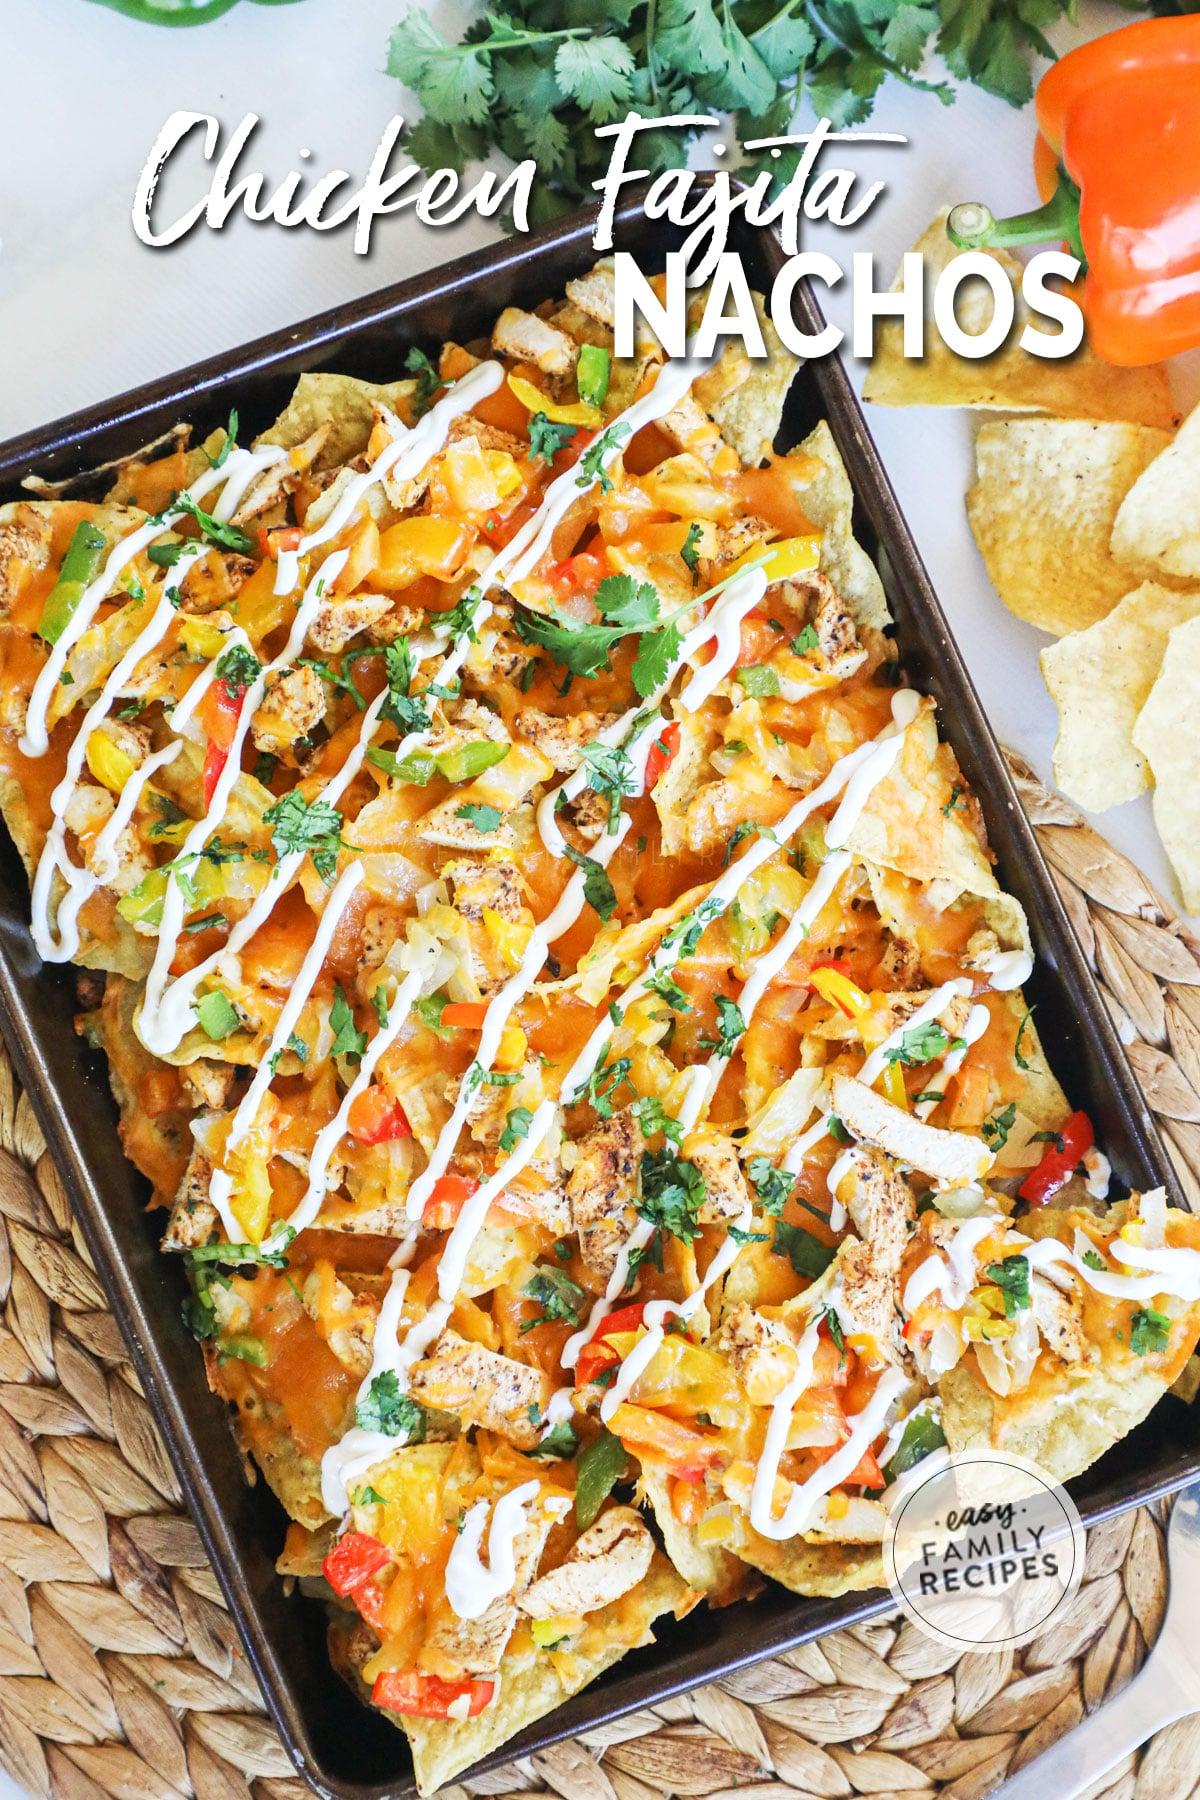 Overhead view of sheet pan baked chicken fajita nachos